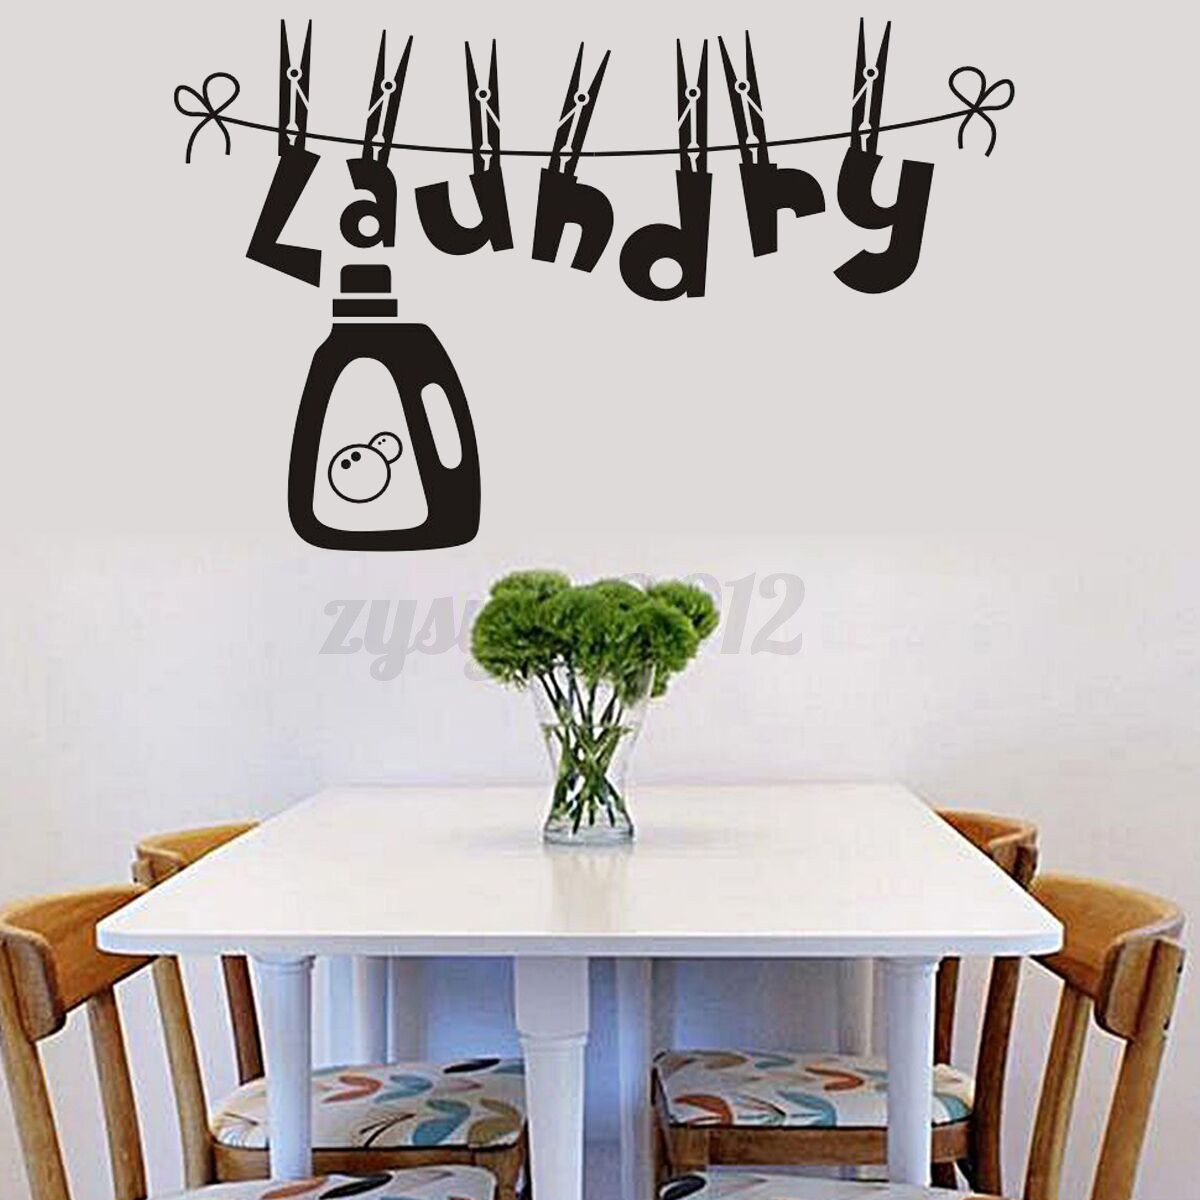 laundry room wall sticker removable wallpaper art mural